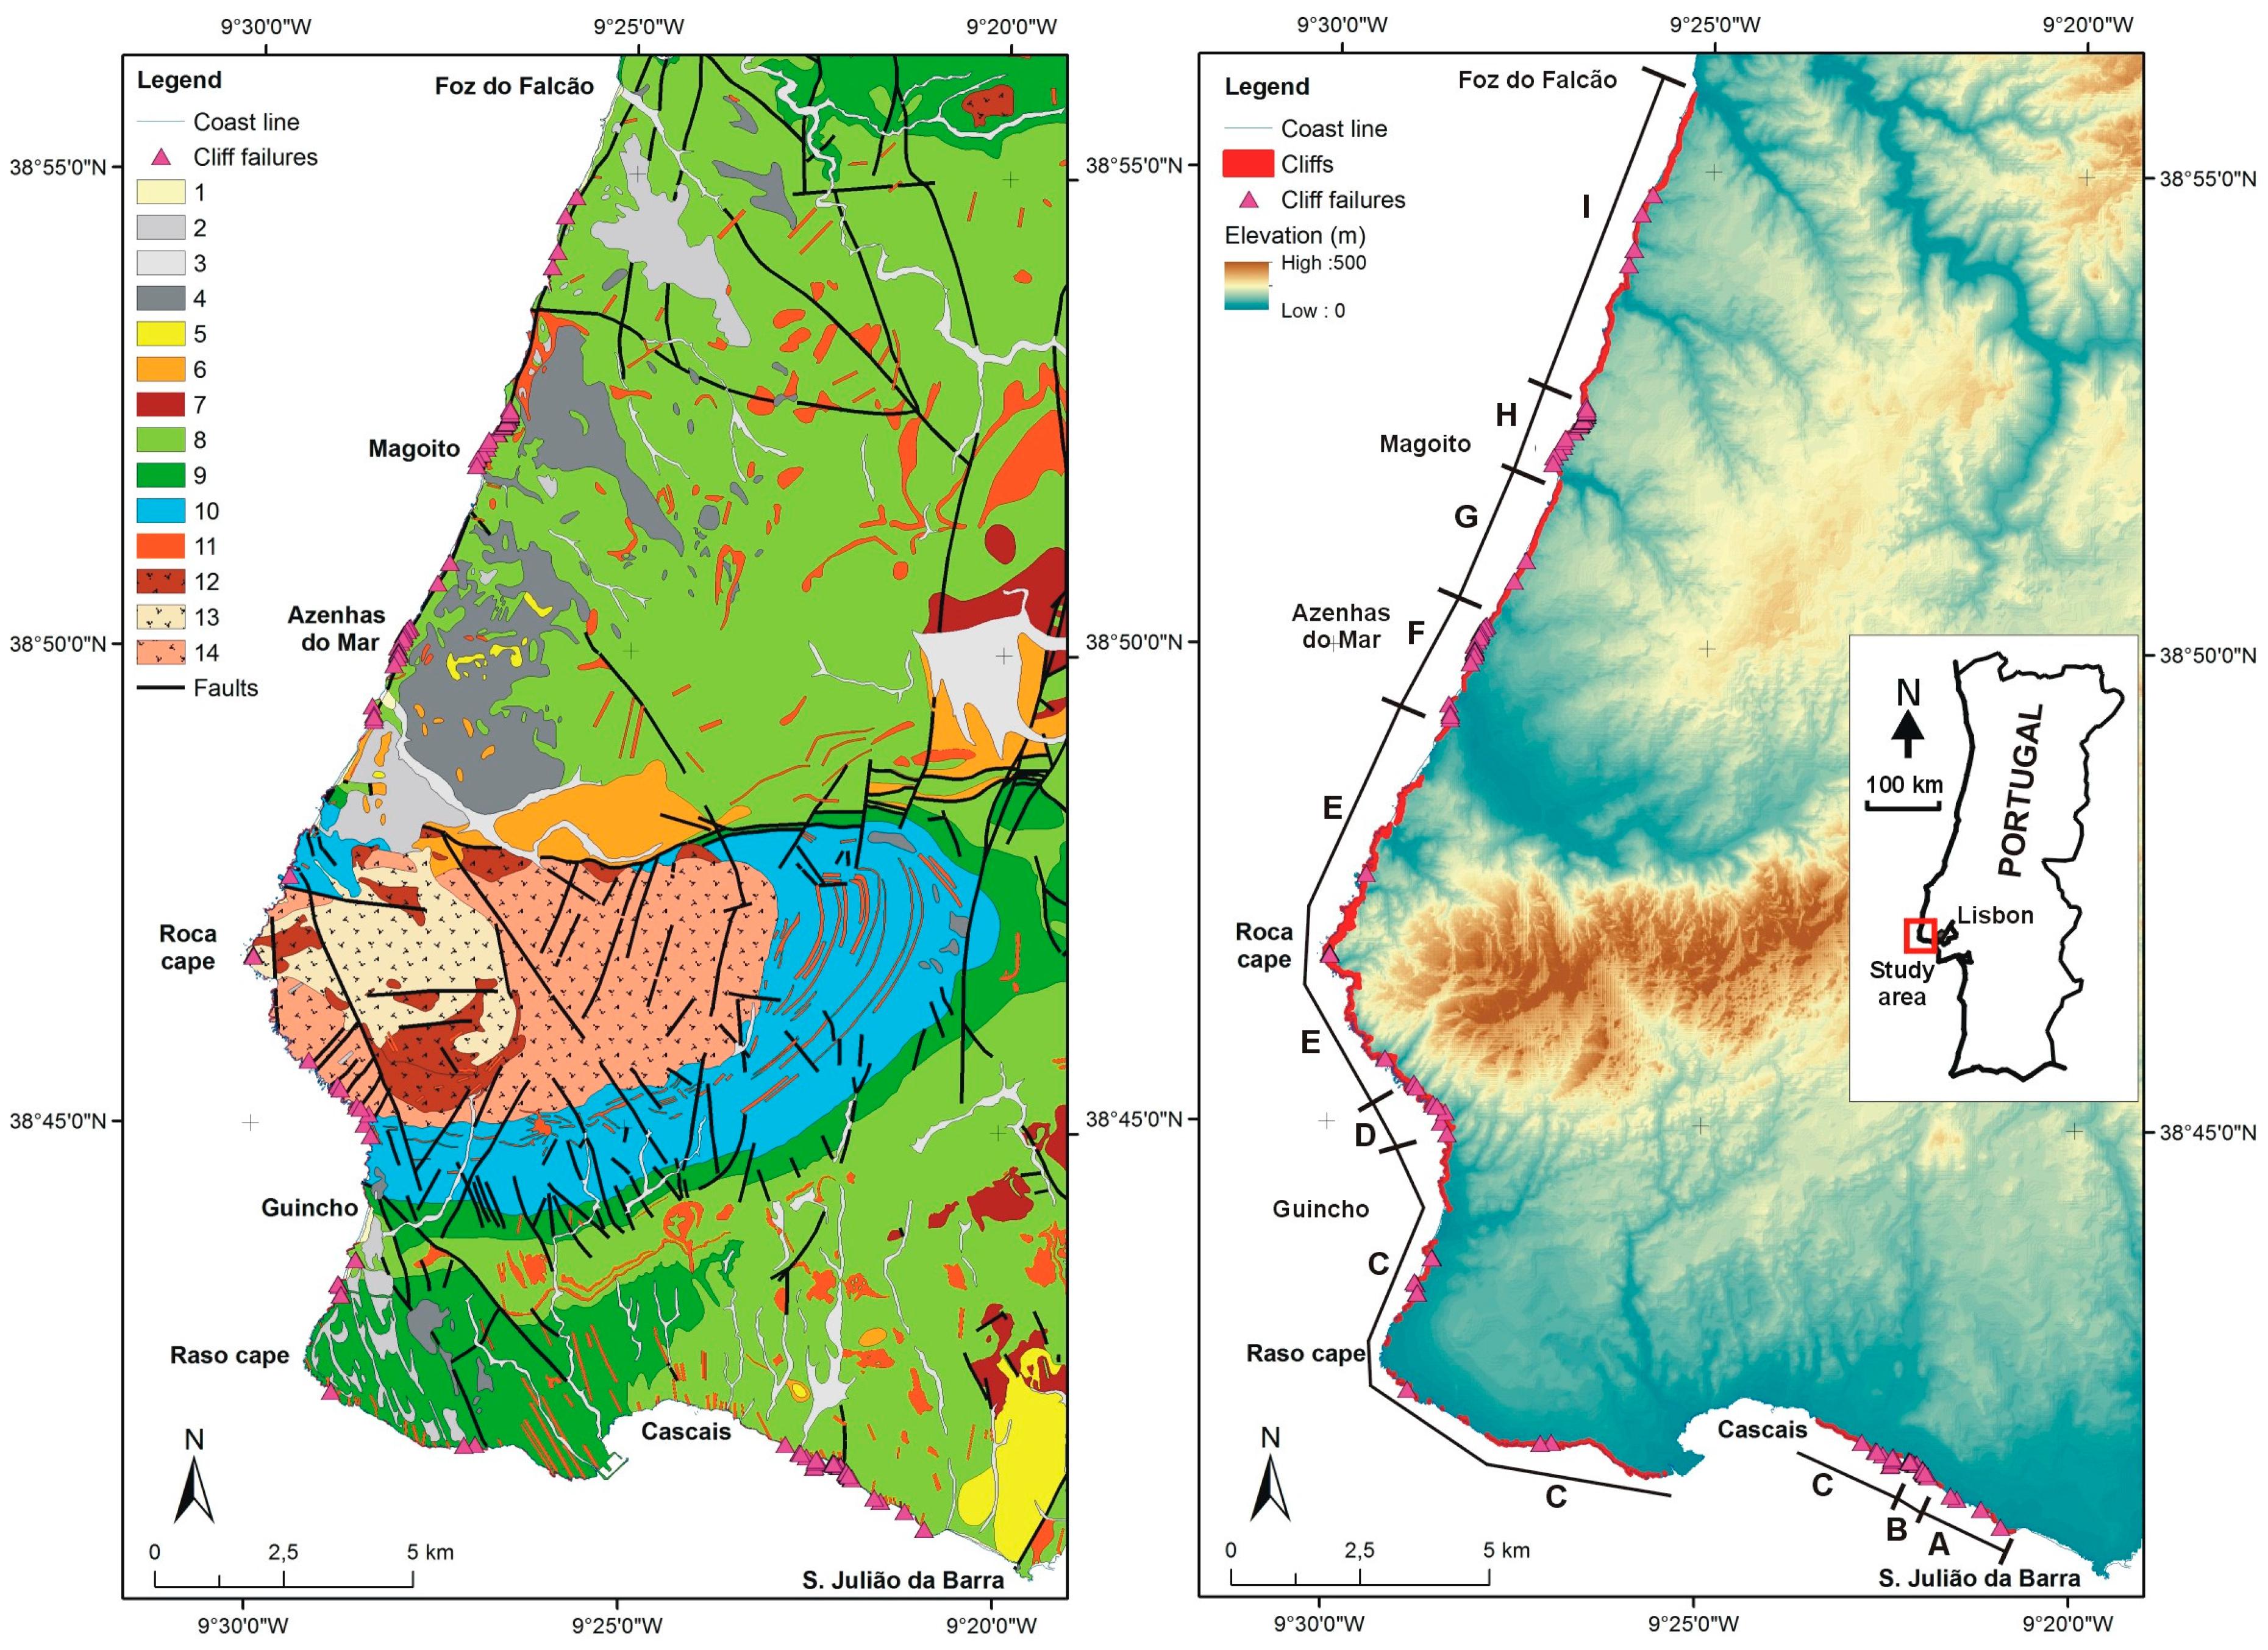 Geosciences | Free Full-Text | Regional Scale Sea Cliff Hazard ... on